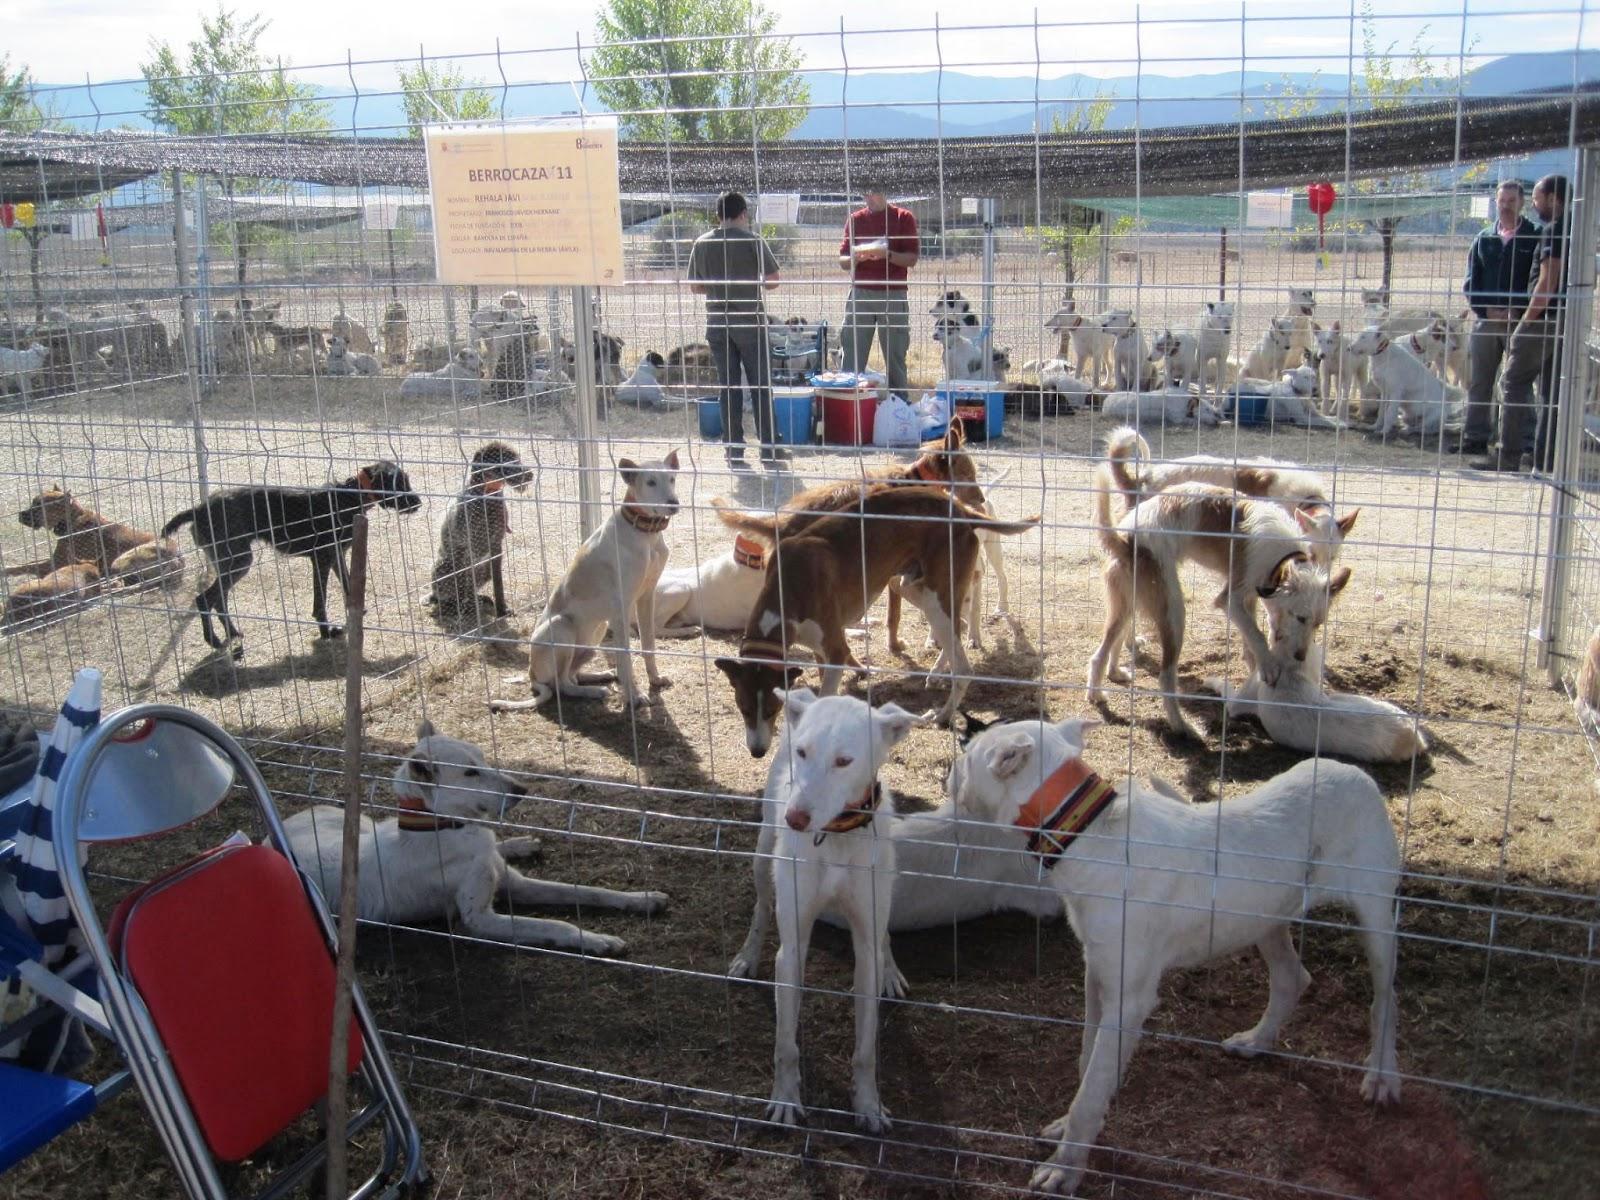 R e h a l a iii feria de perros de caza berrocaza - Navalmoral de la sierra ...